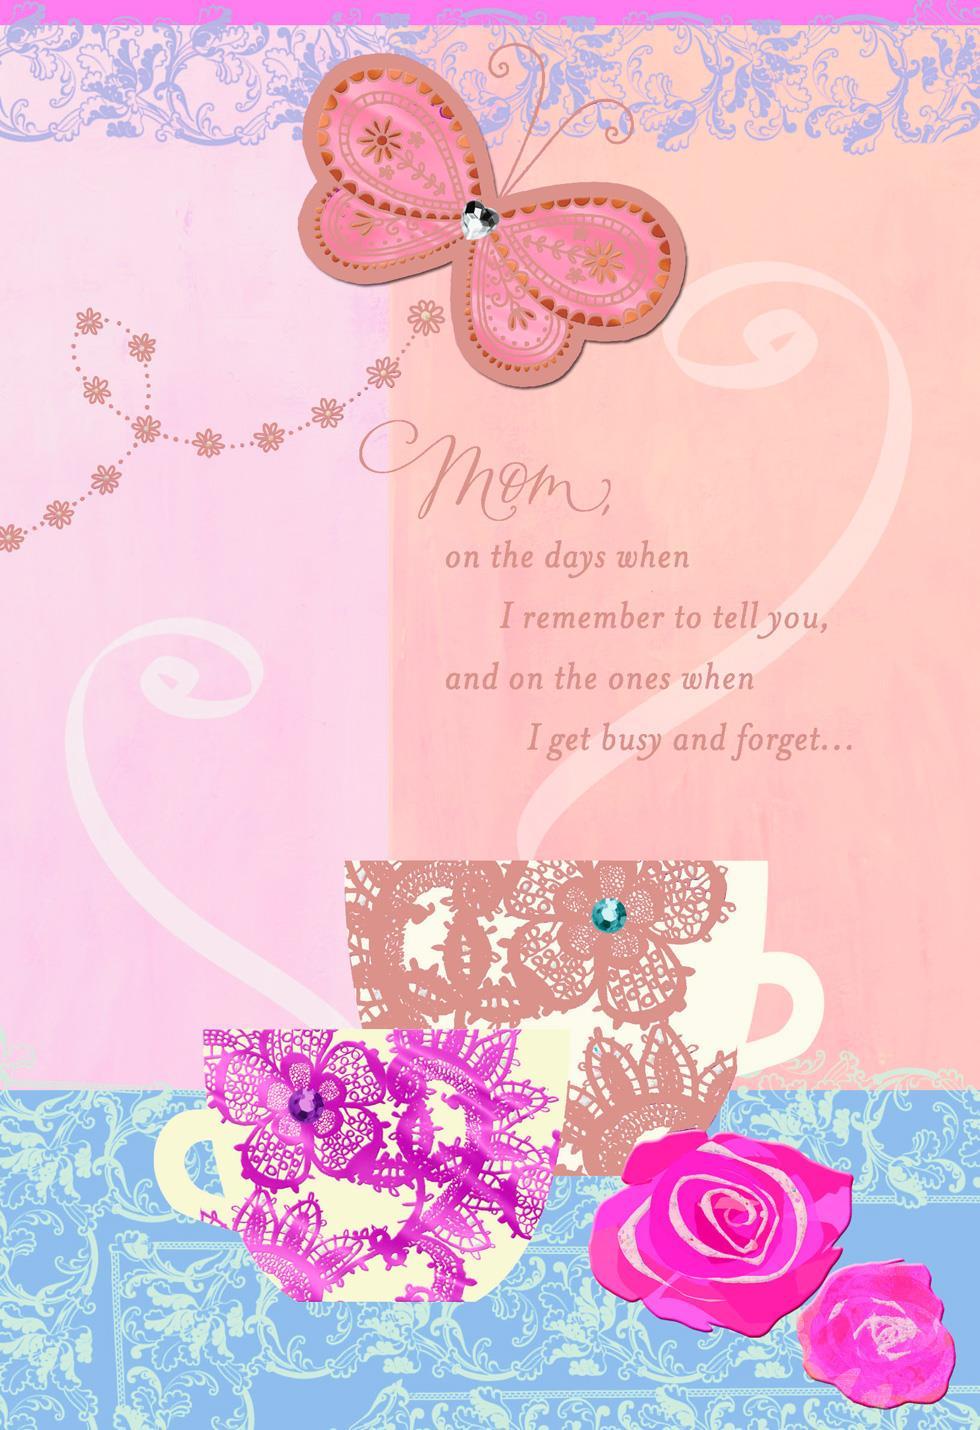 Wonderful Mom and Grandma Birthday Card for Mom - Greeting ...